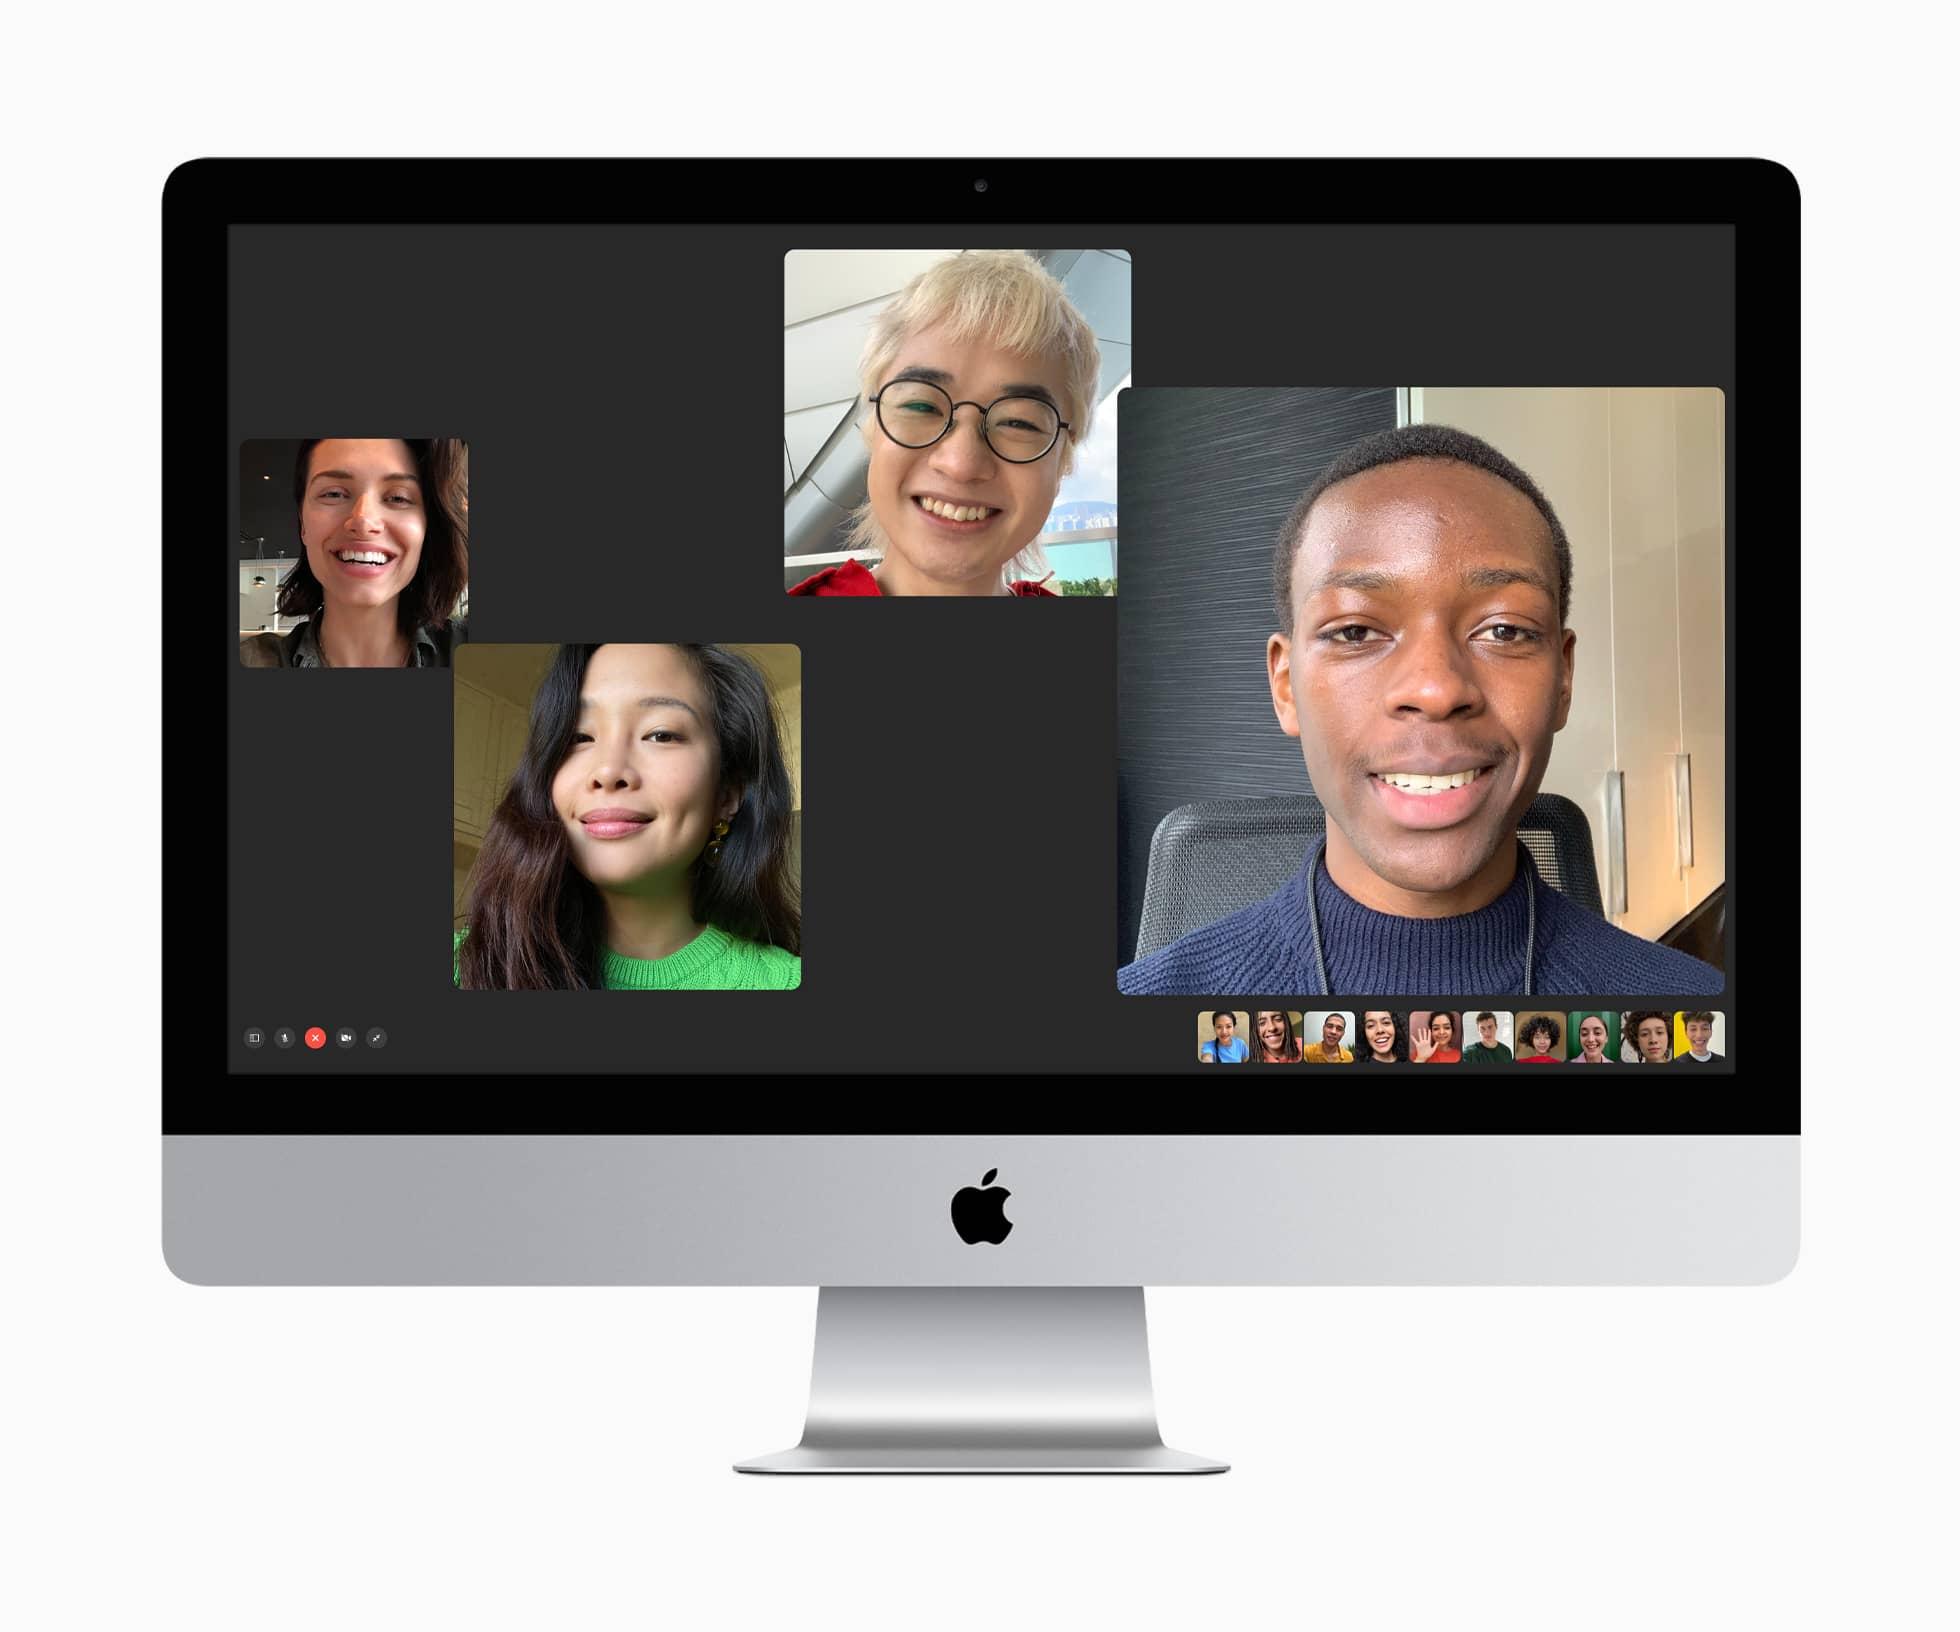 Apple imac macos facetime 08042020